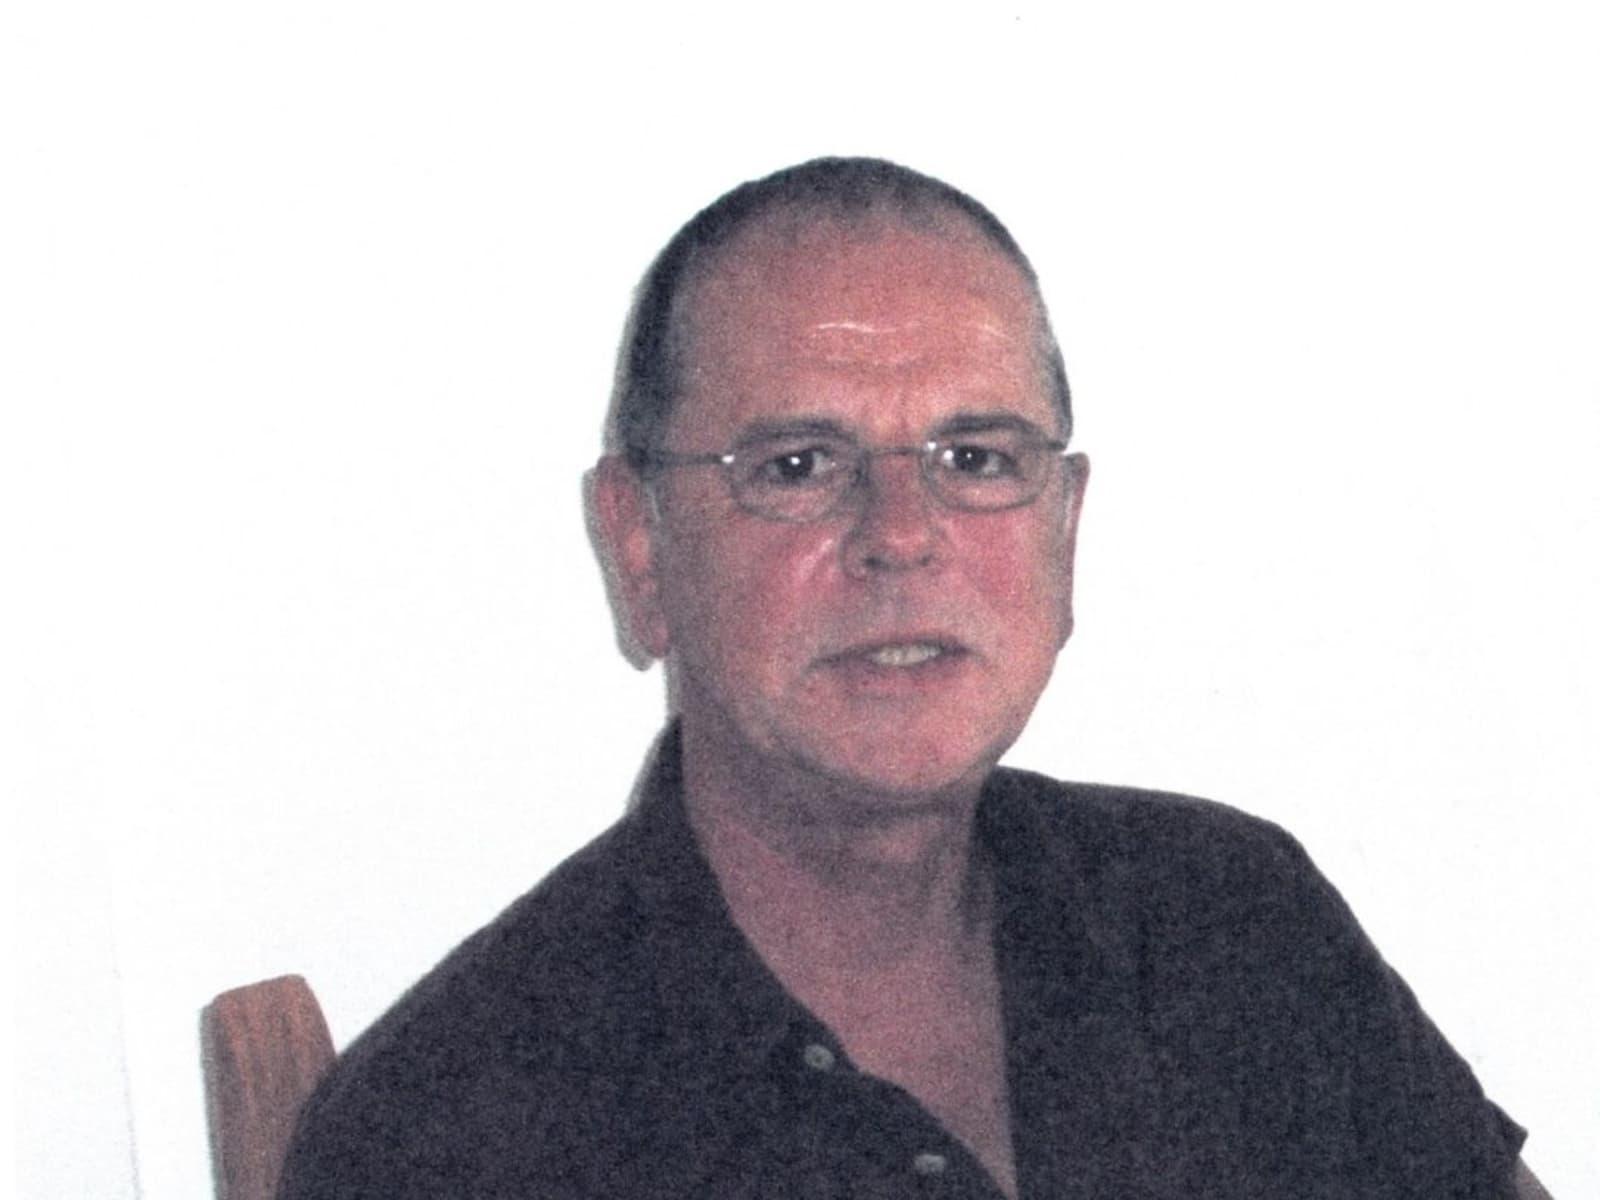 David from Southport, United Kingdom